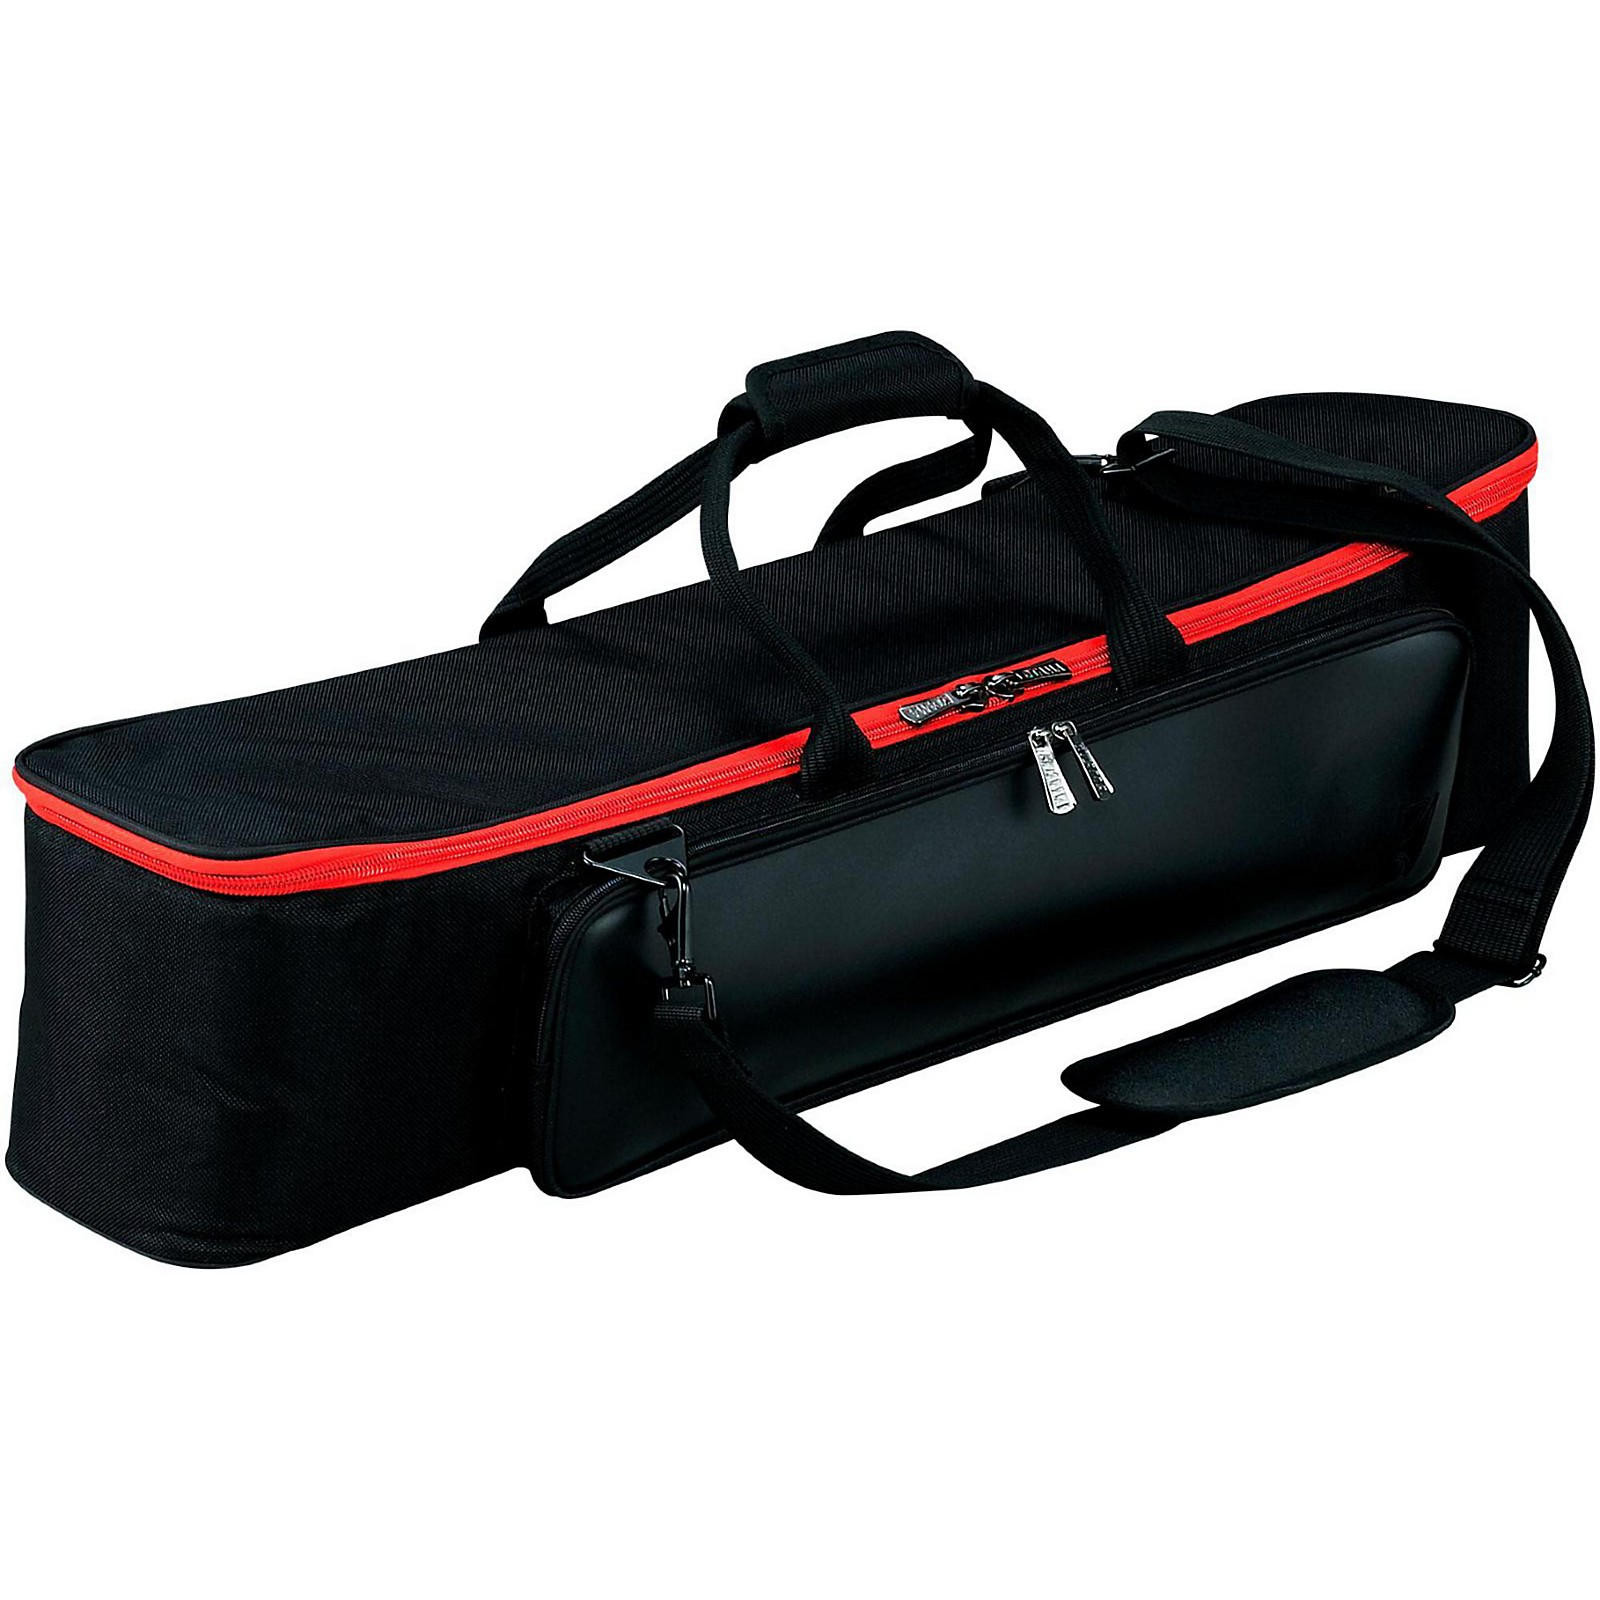 TAMA Powerpad Hardware Bag